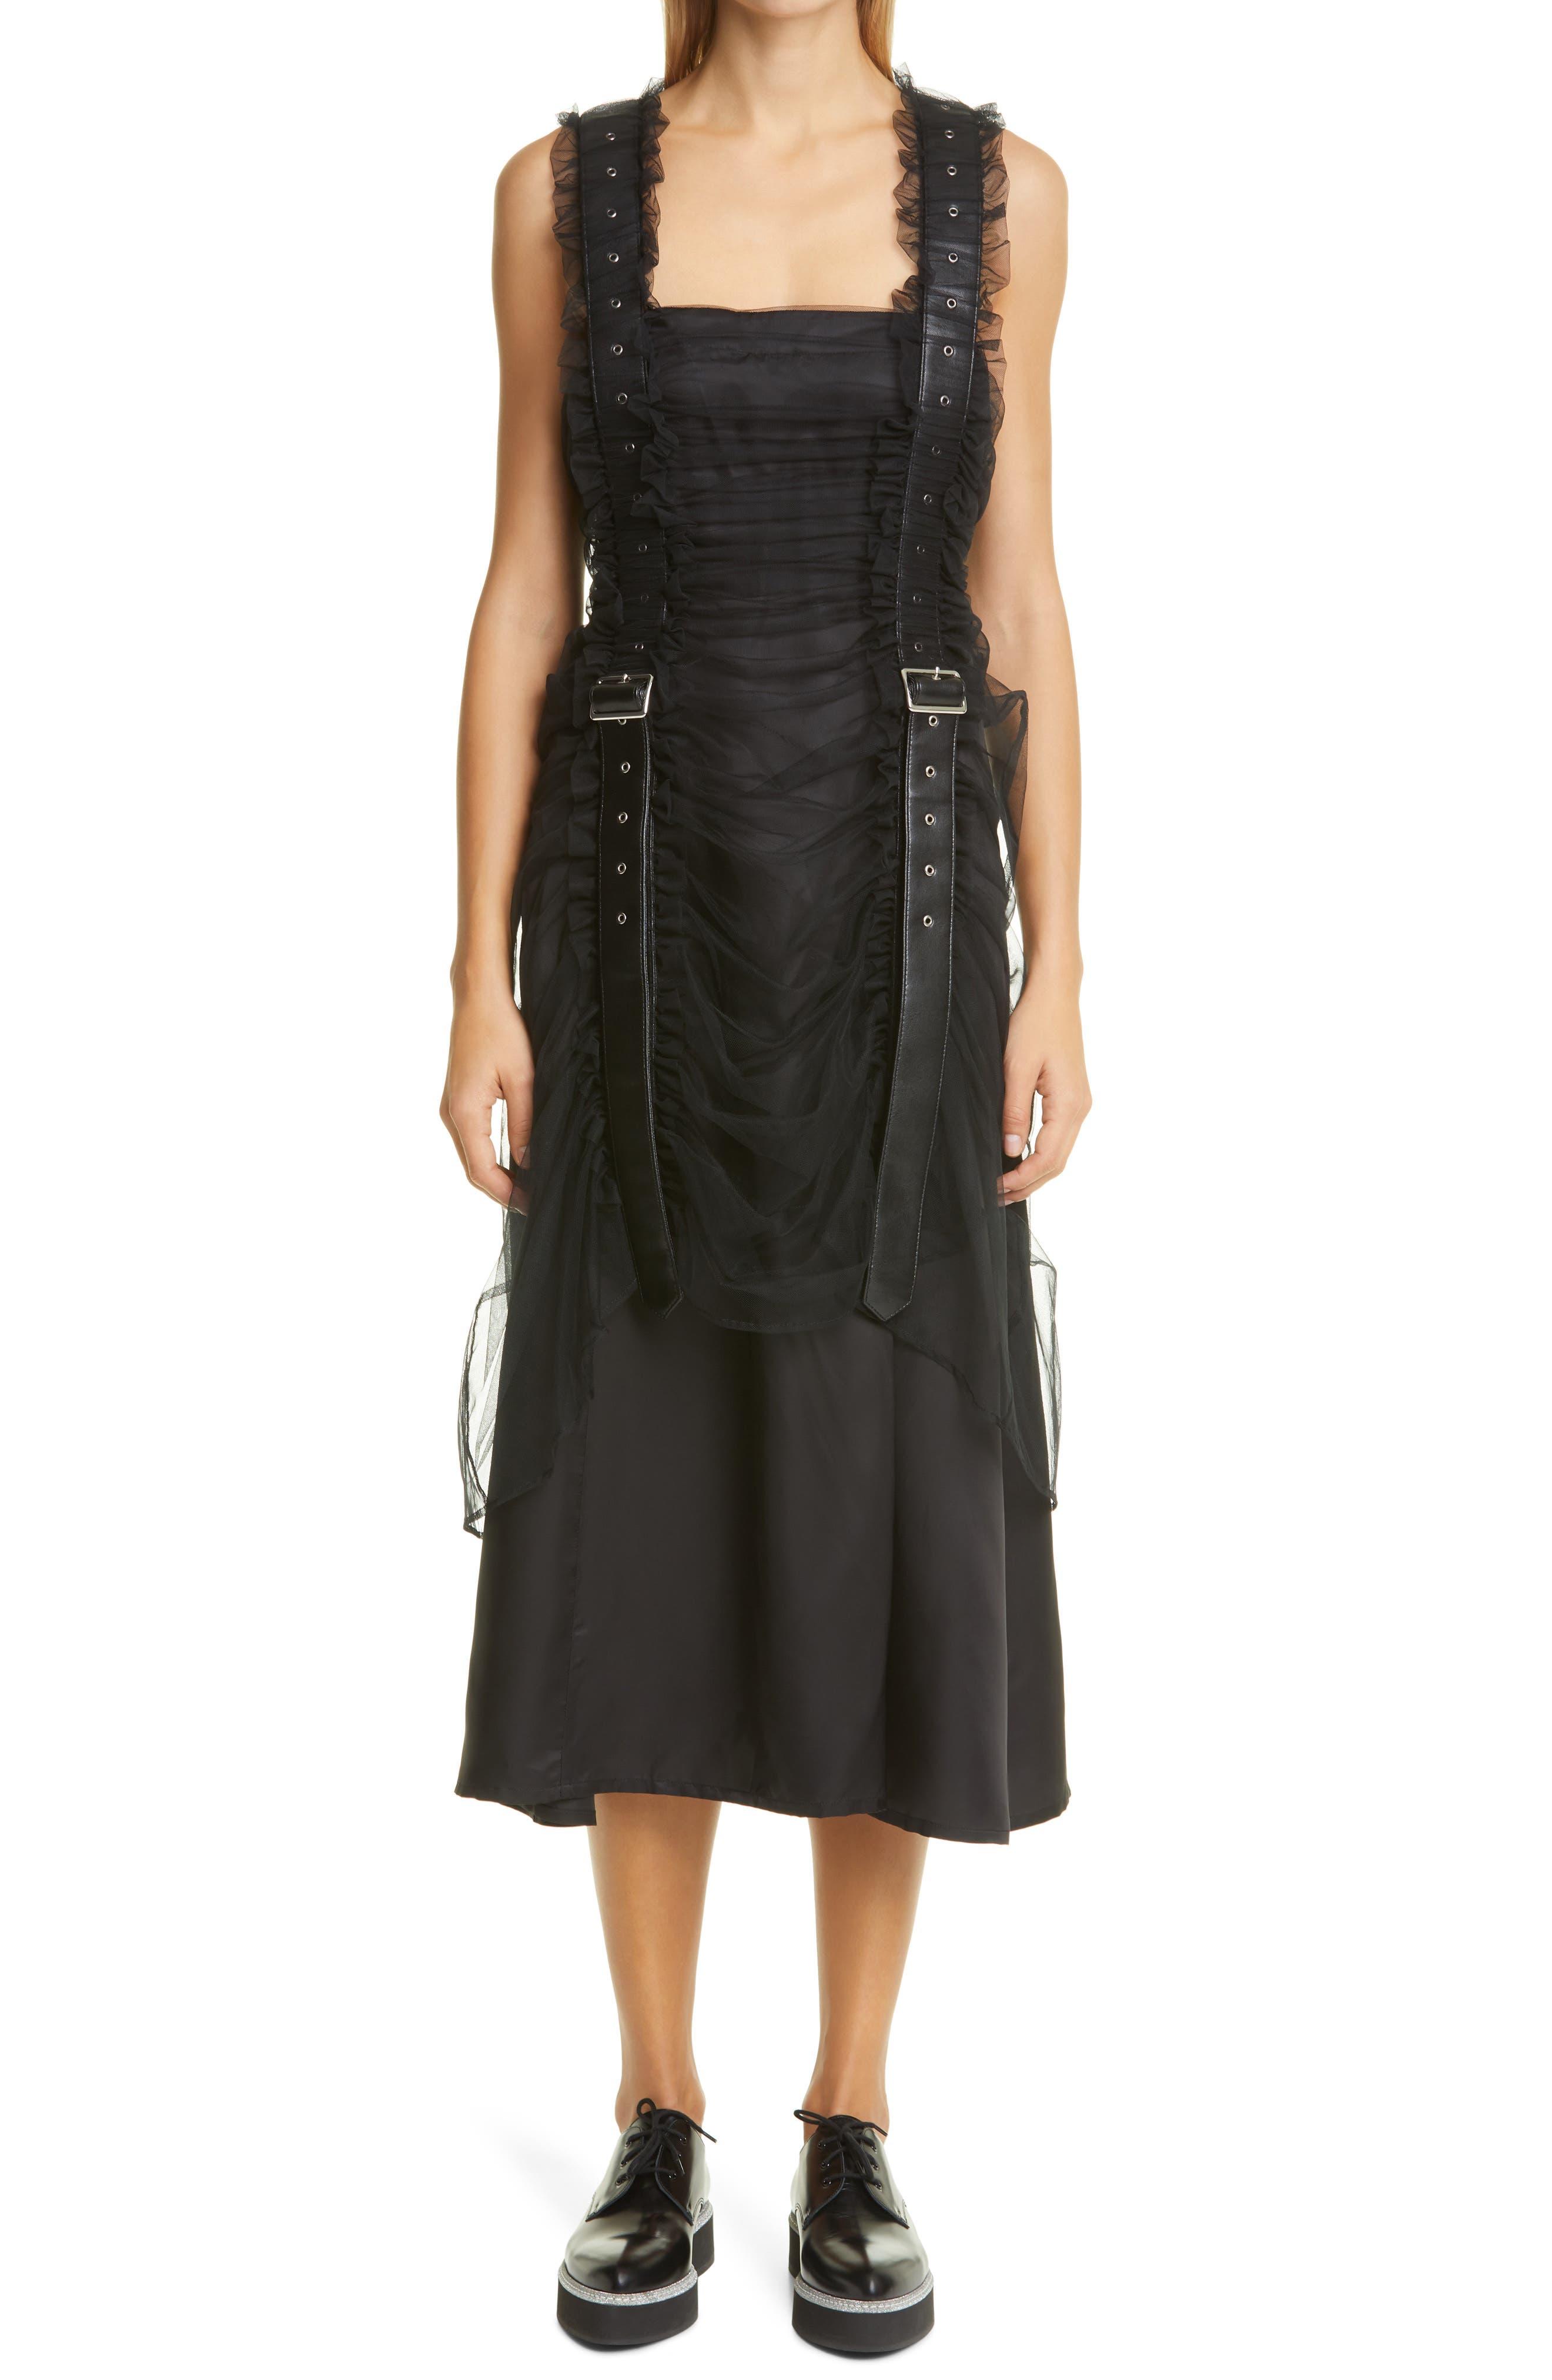 Noir kei ninomiya Suspender Strap Tulle Layer Dress | Nordstrom